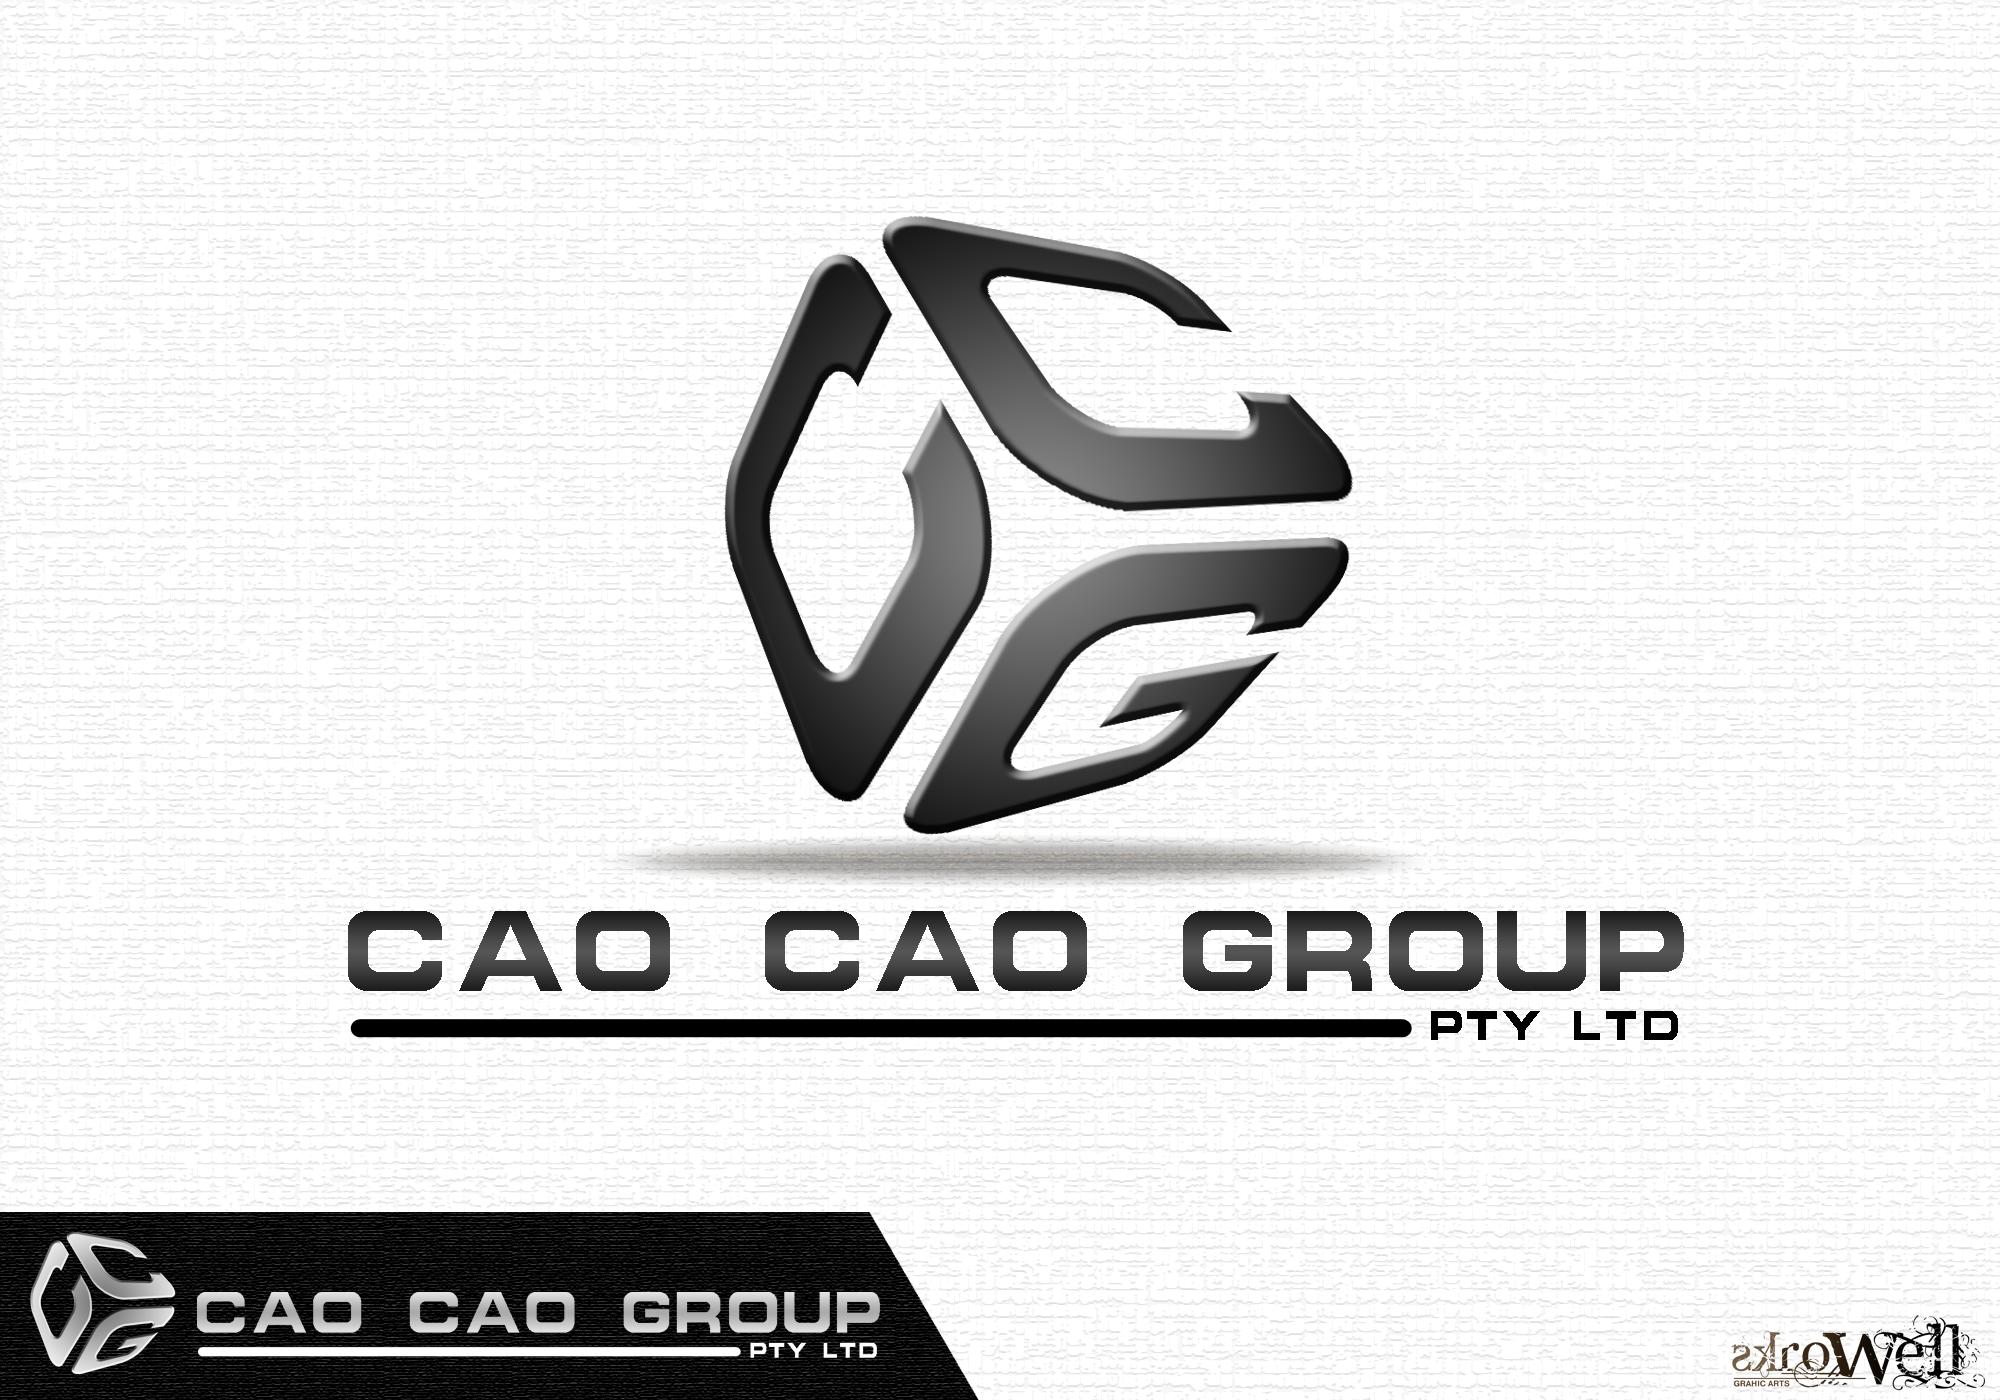 Logo Design by Rowell - Entry No. 112 in the Logo Design Contest cao cao group pty ltd Logo Design.